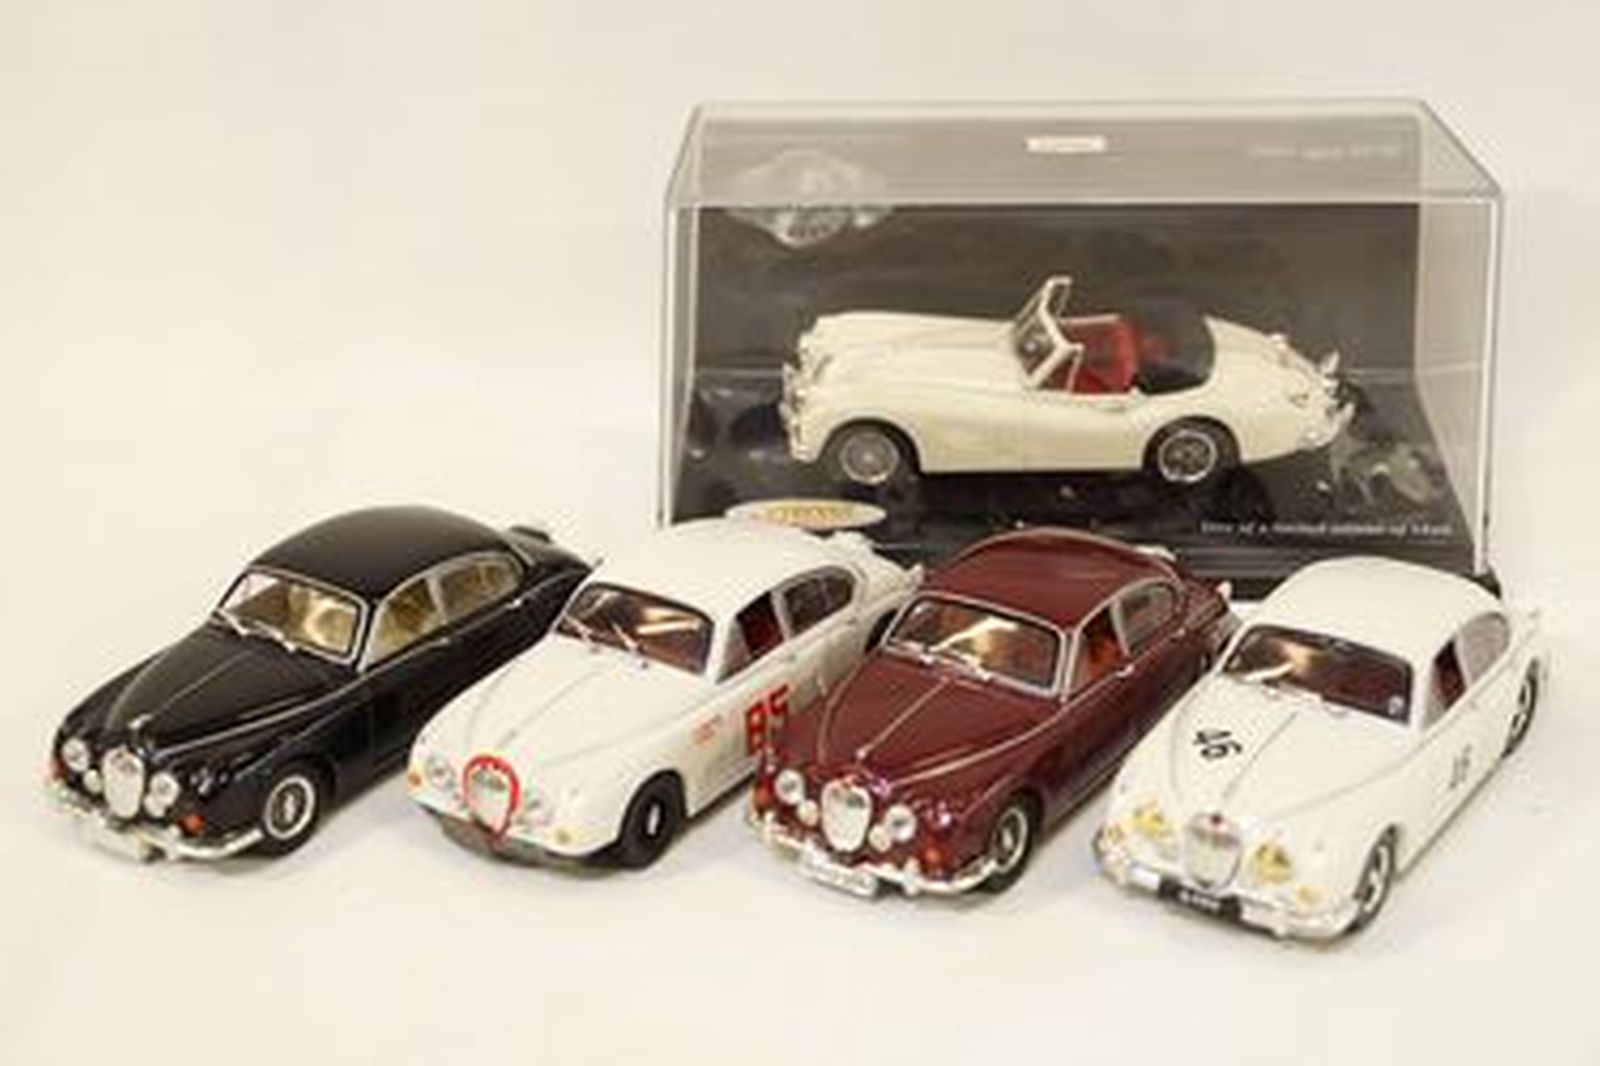 Model Cars x 5 - Jaguar 240/340, Mk2 #46, Mk2 V8 #85 & XK140 by Vitesse